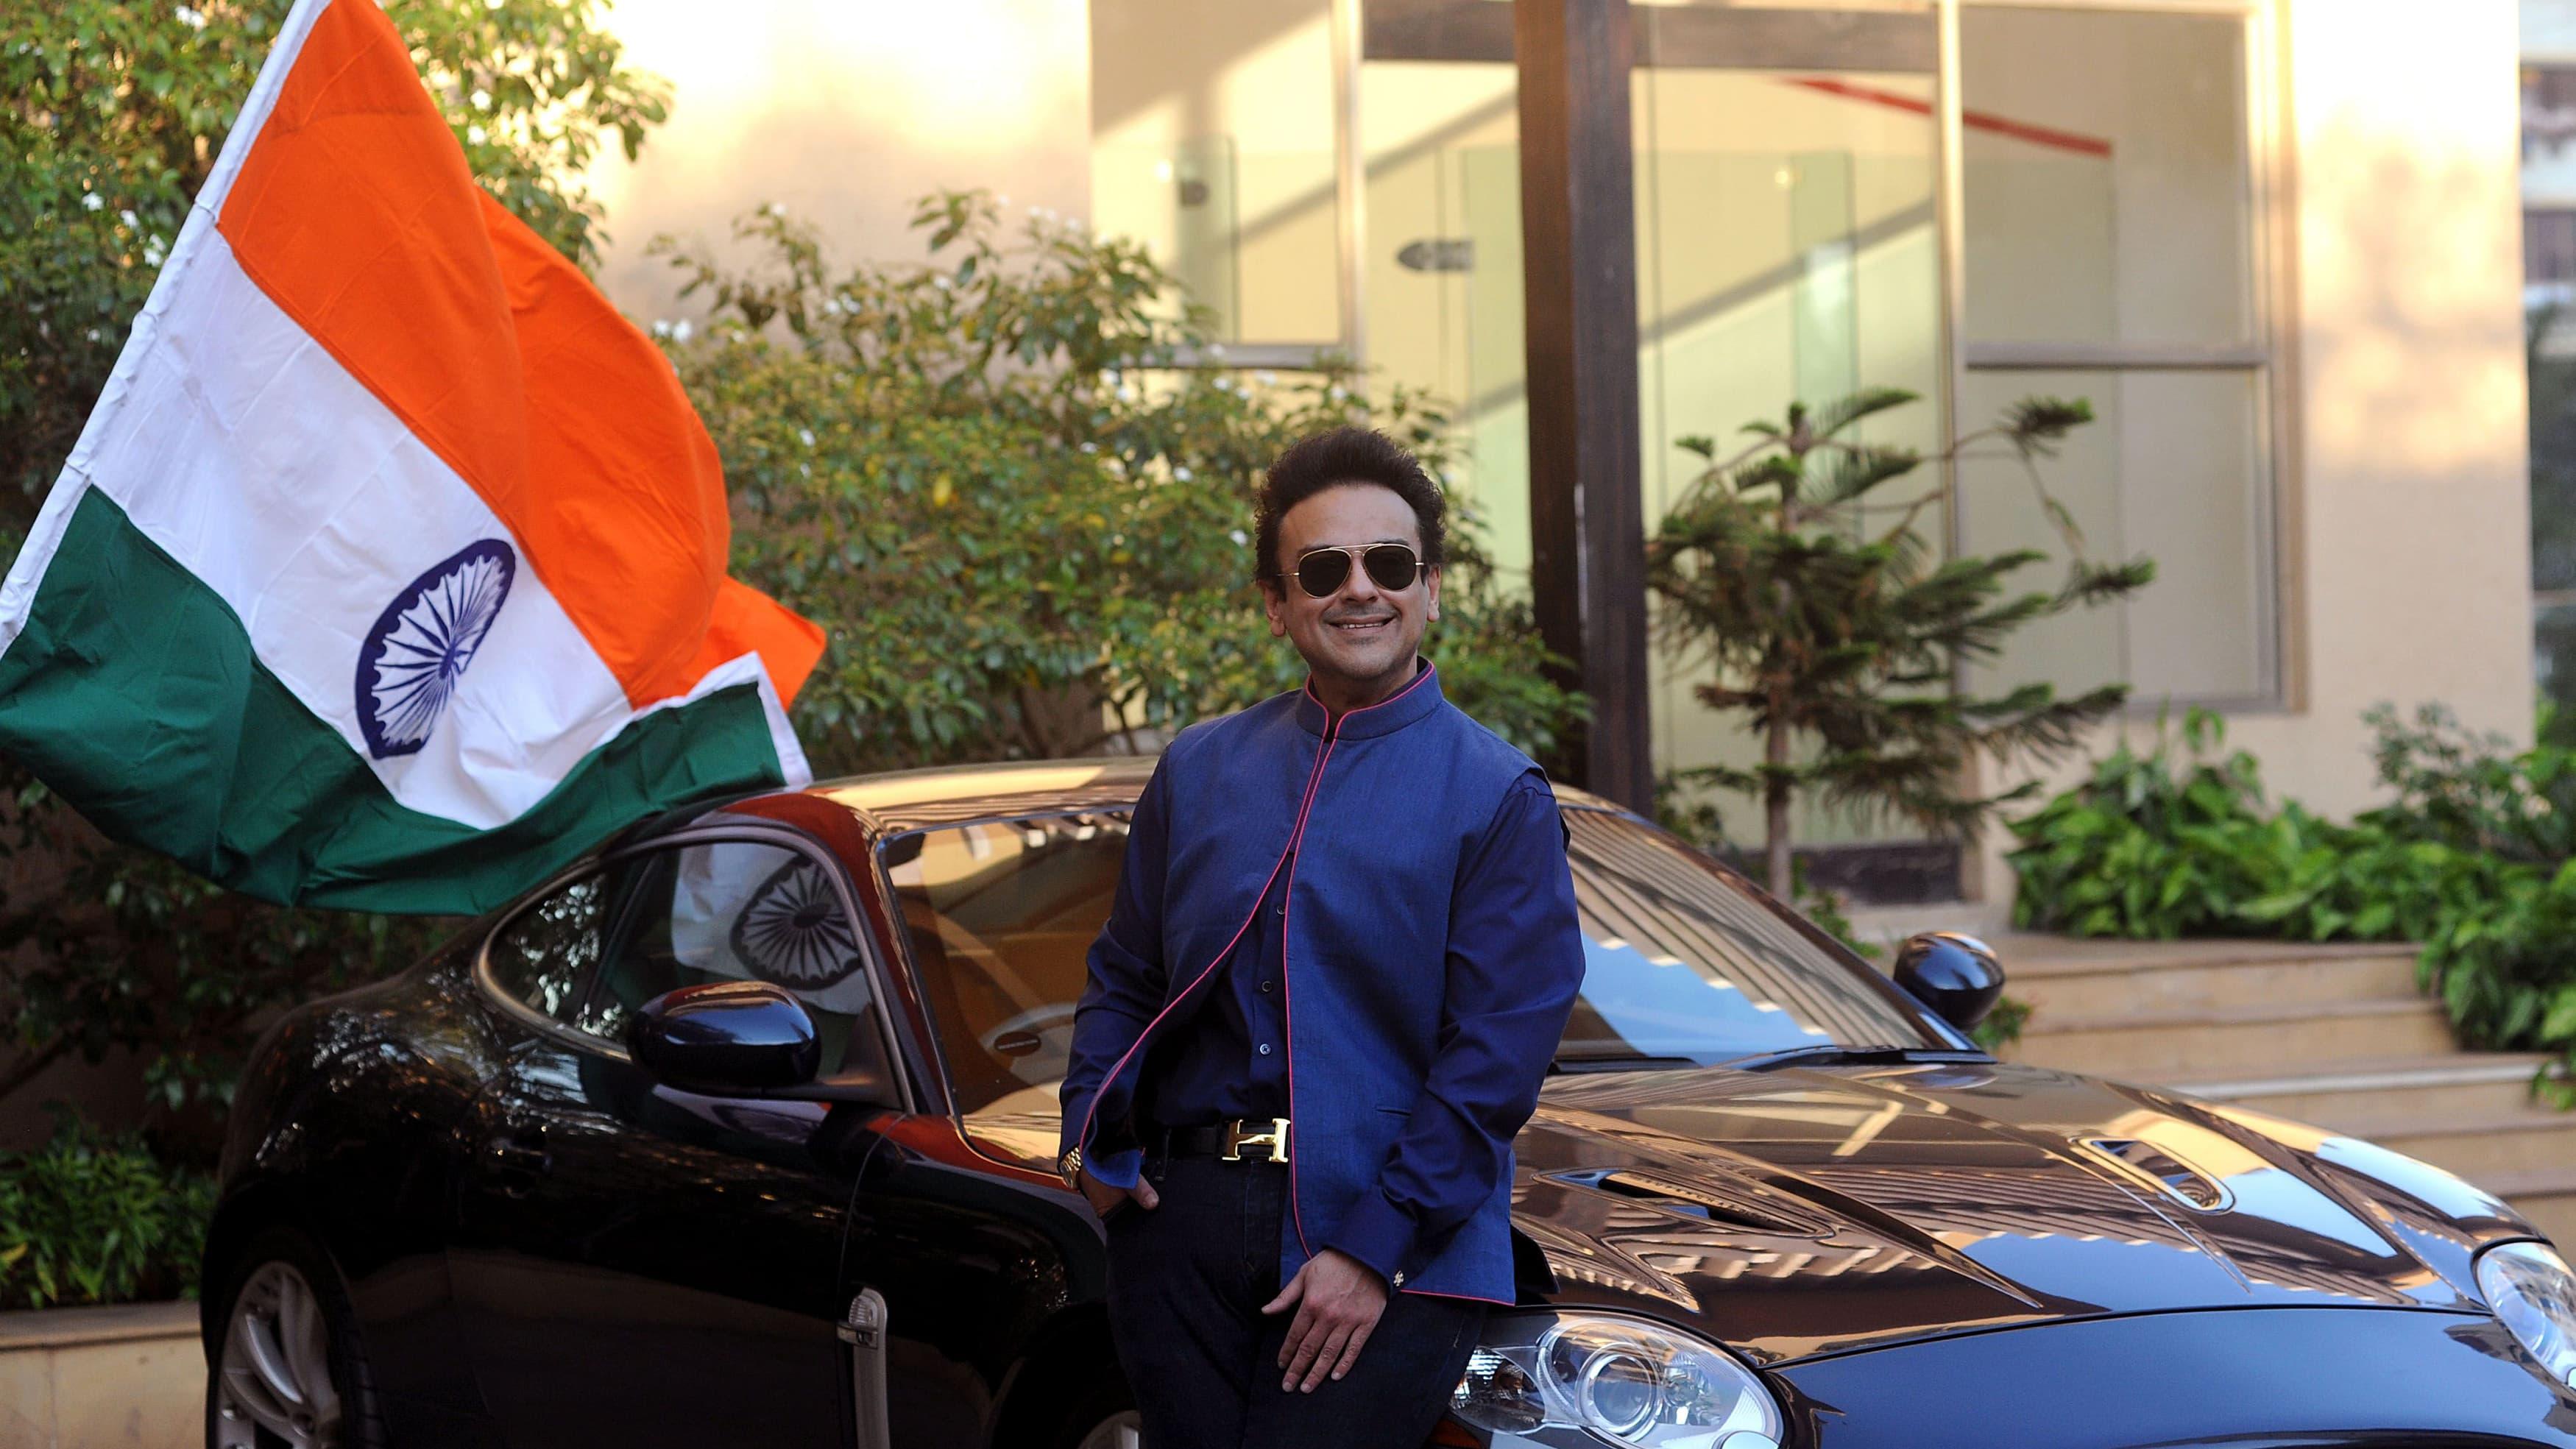 Adnan Sami poses as he celebrates being granted Indian citizenship. —AFP